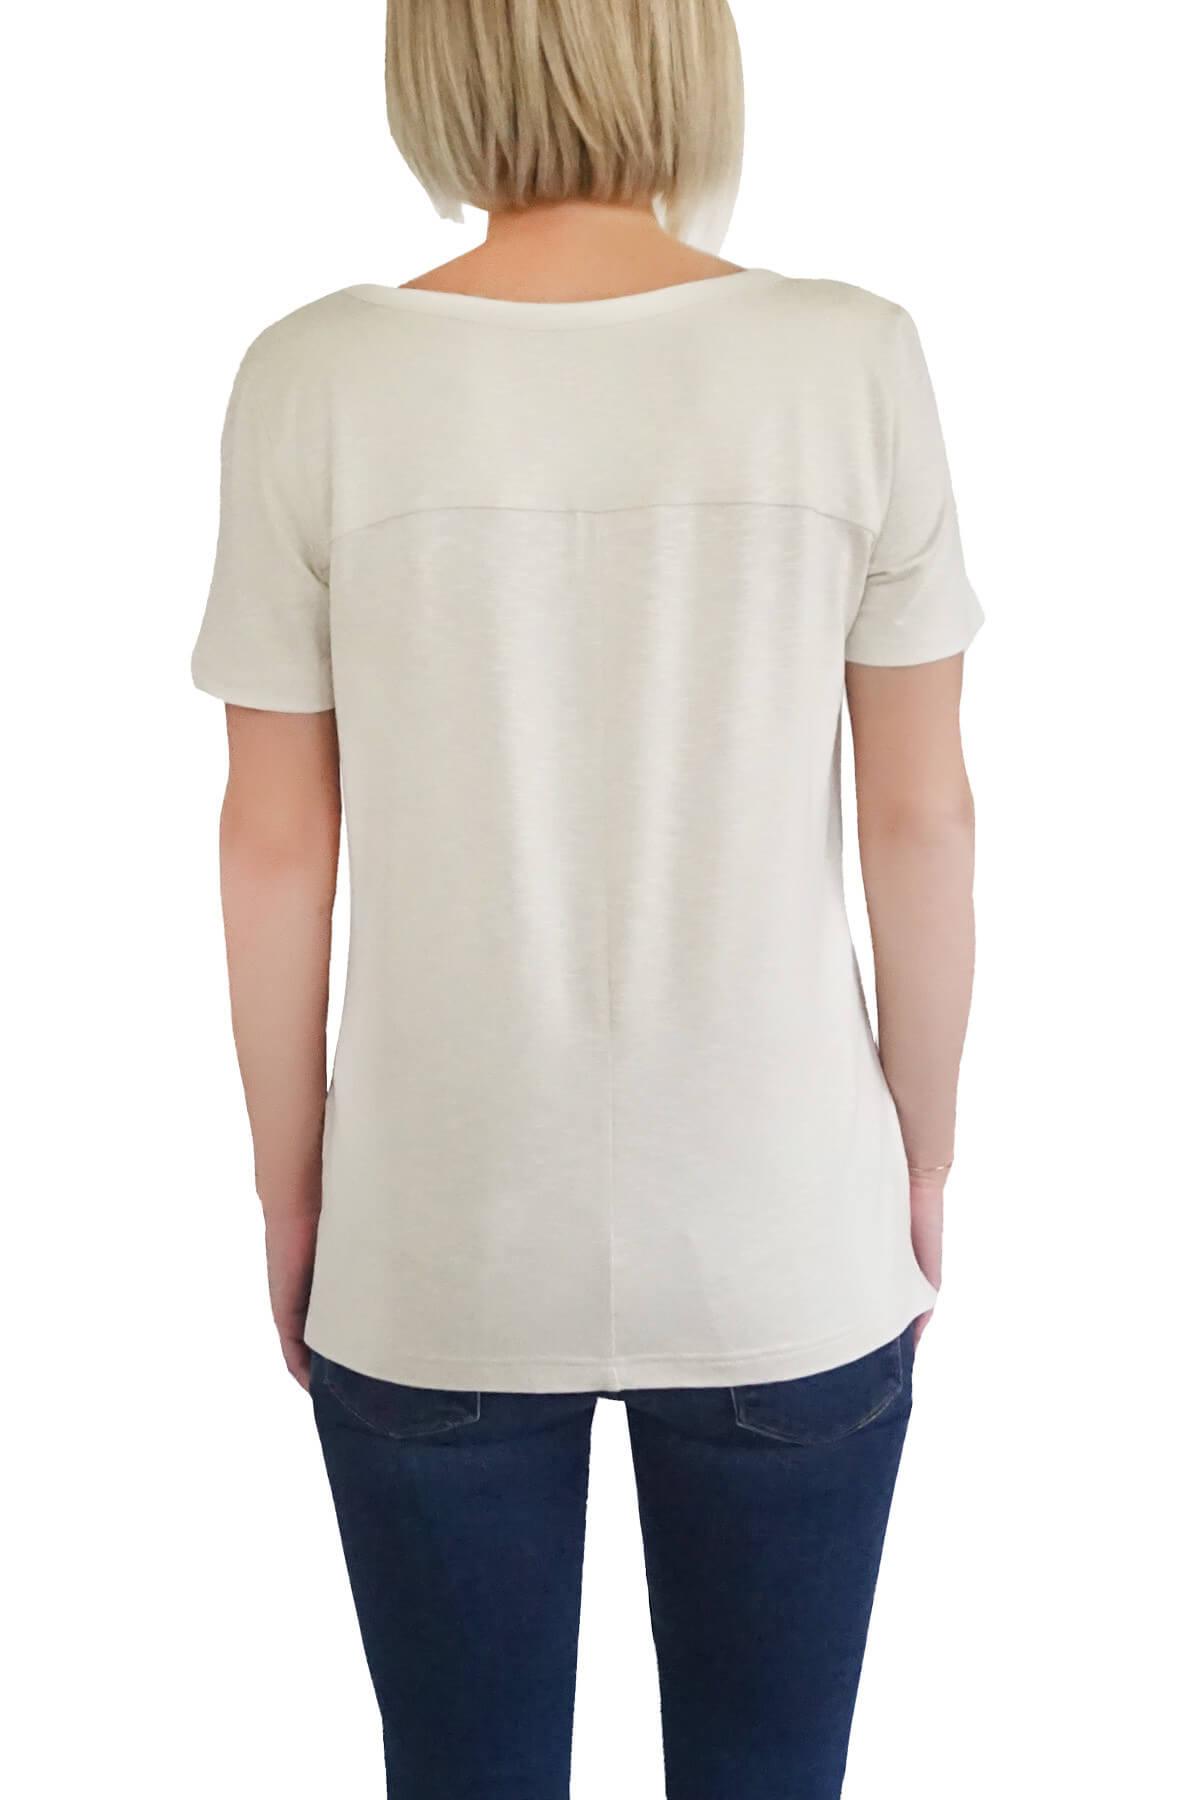 MOF Kadın Taş T-Shirt SYCT-T 2